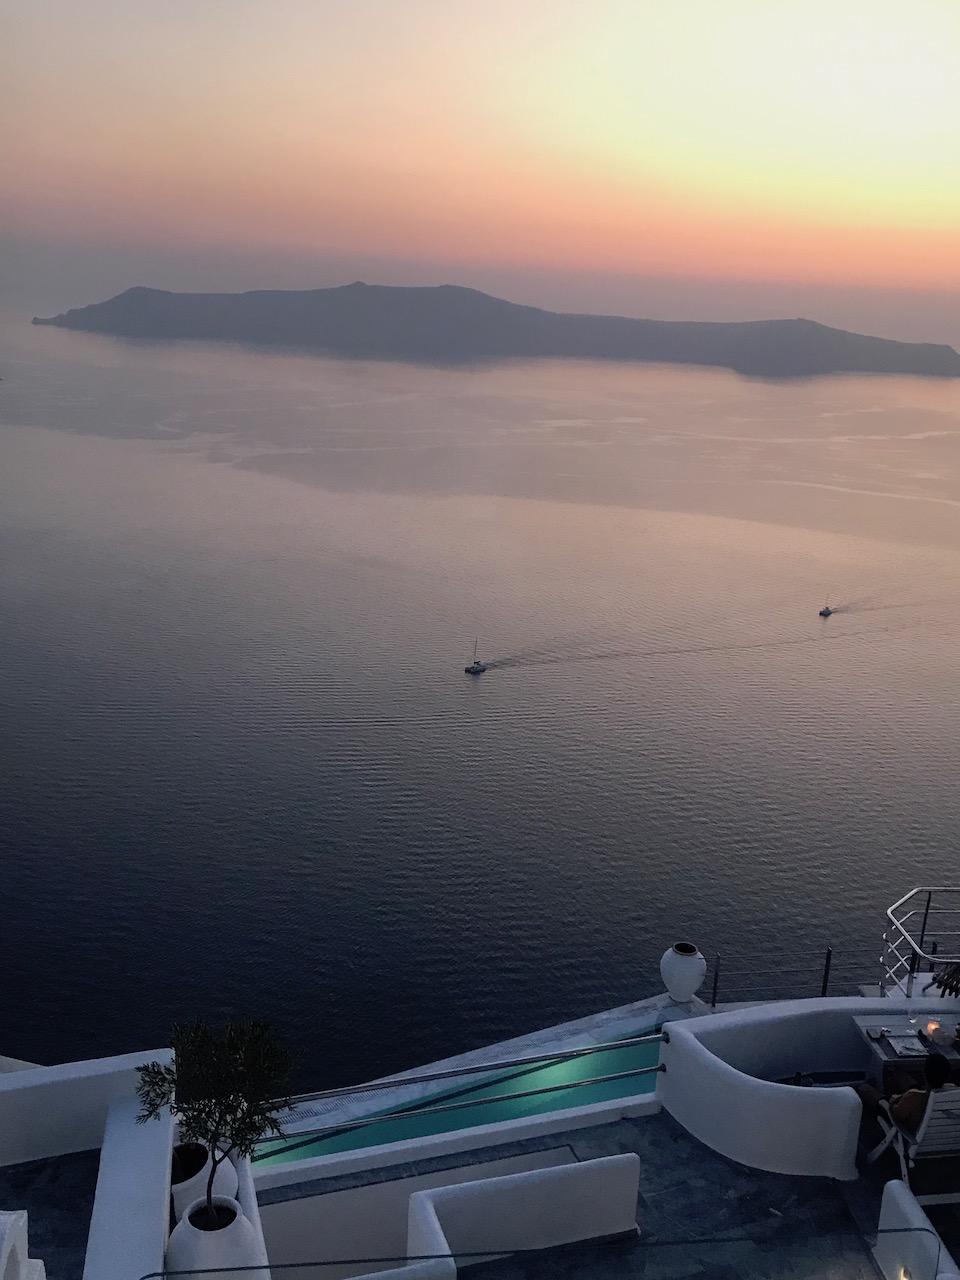 Homeric Poems, Santorini